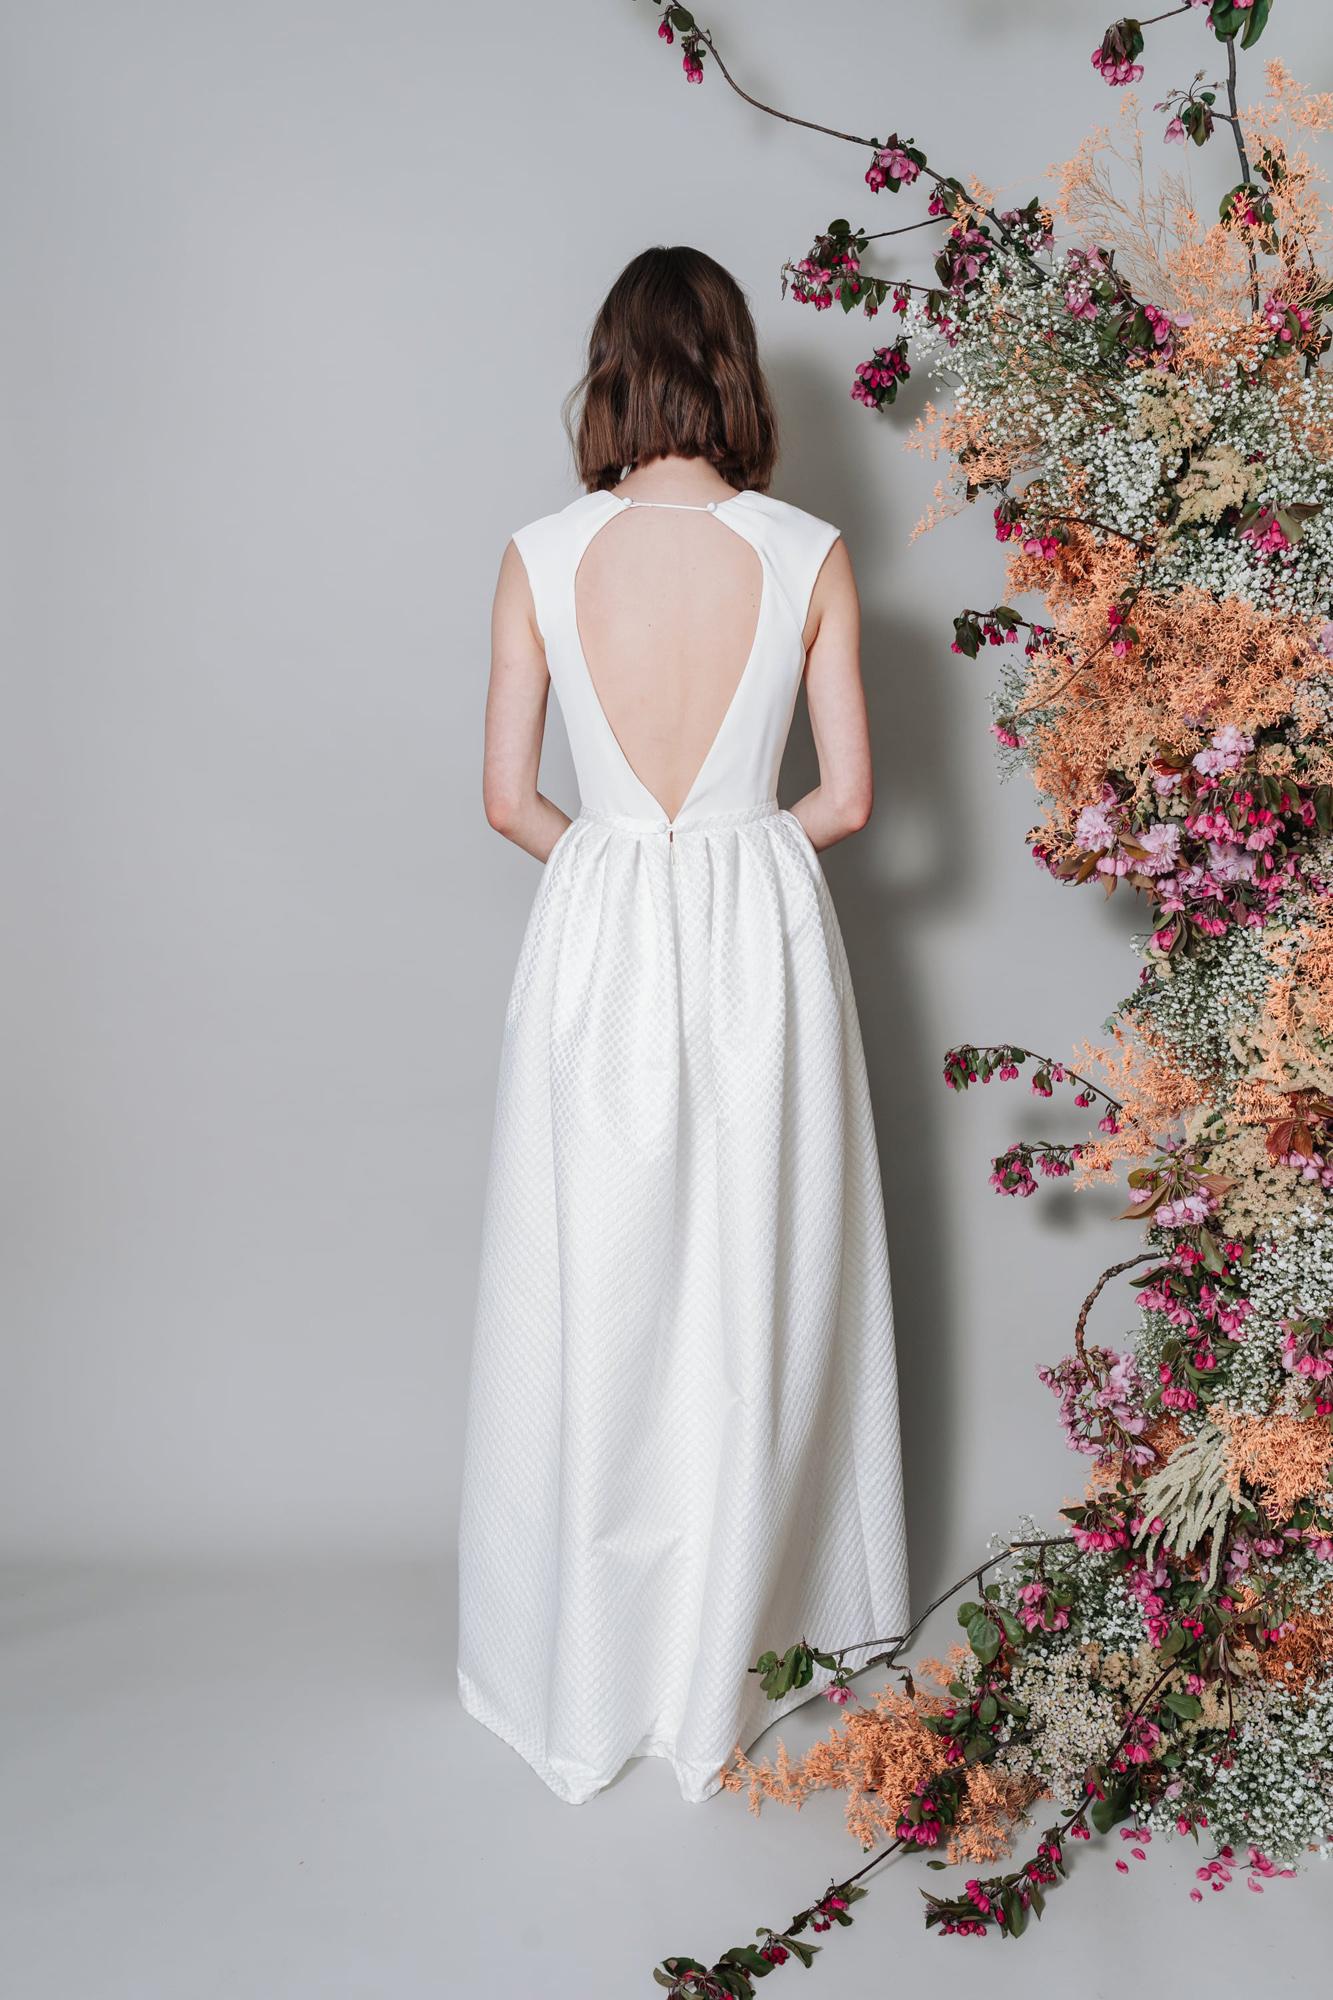 Kate-Beaumont-Sheffield-Zinnia-Modern-Wedding-Gown-Polka-Dot-Pleated-Skirt-9.jpg